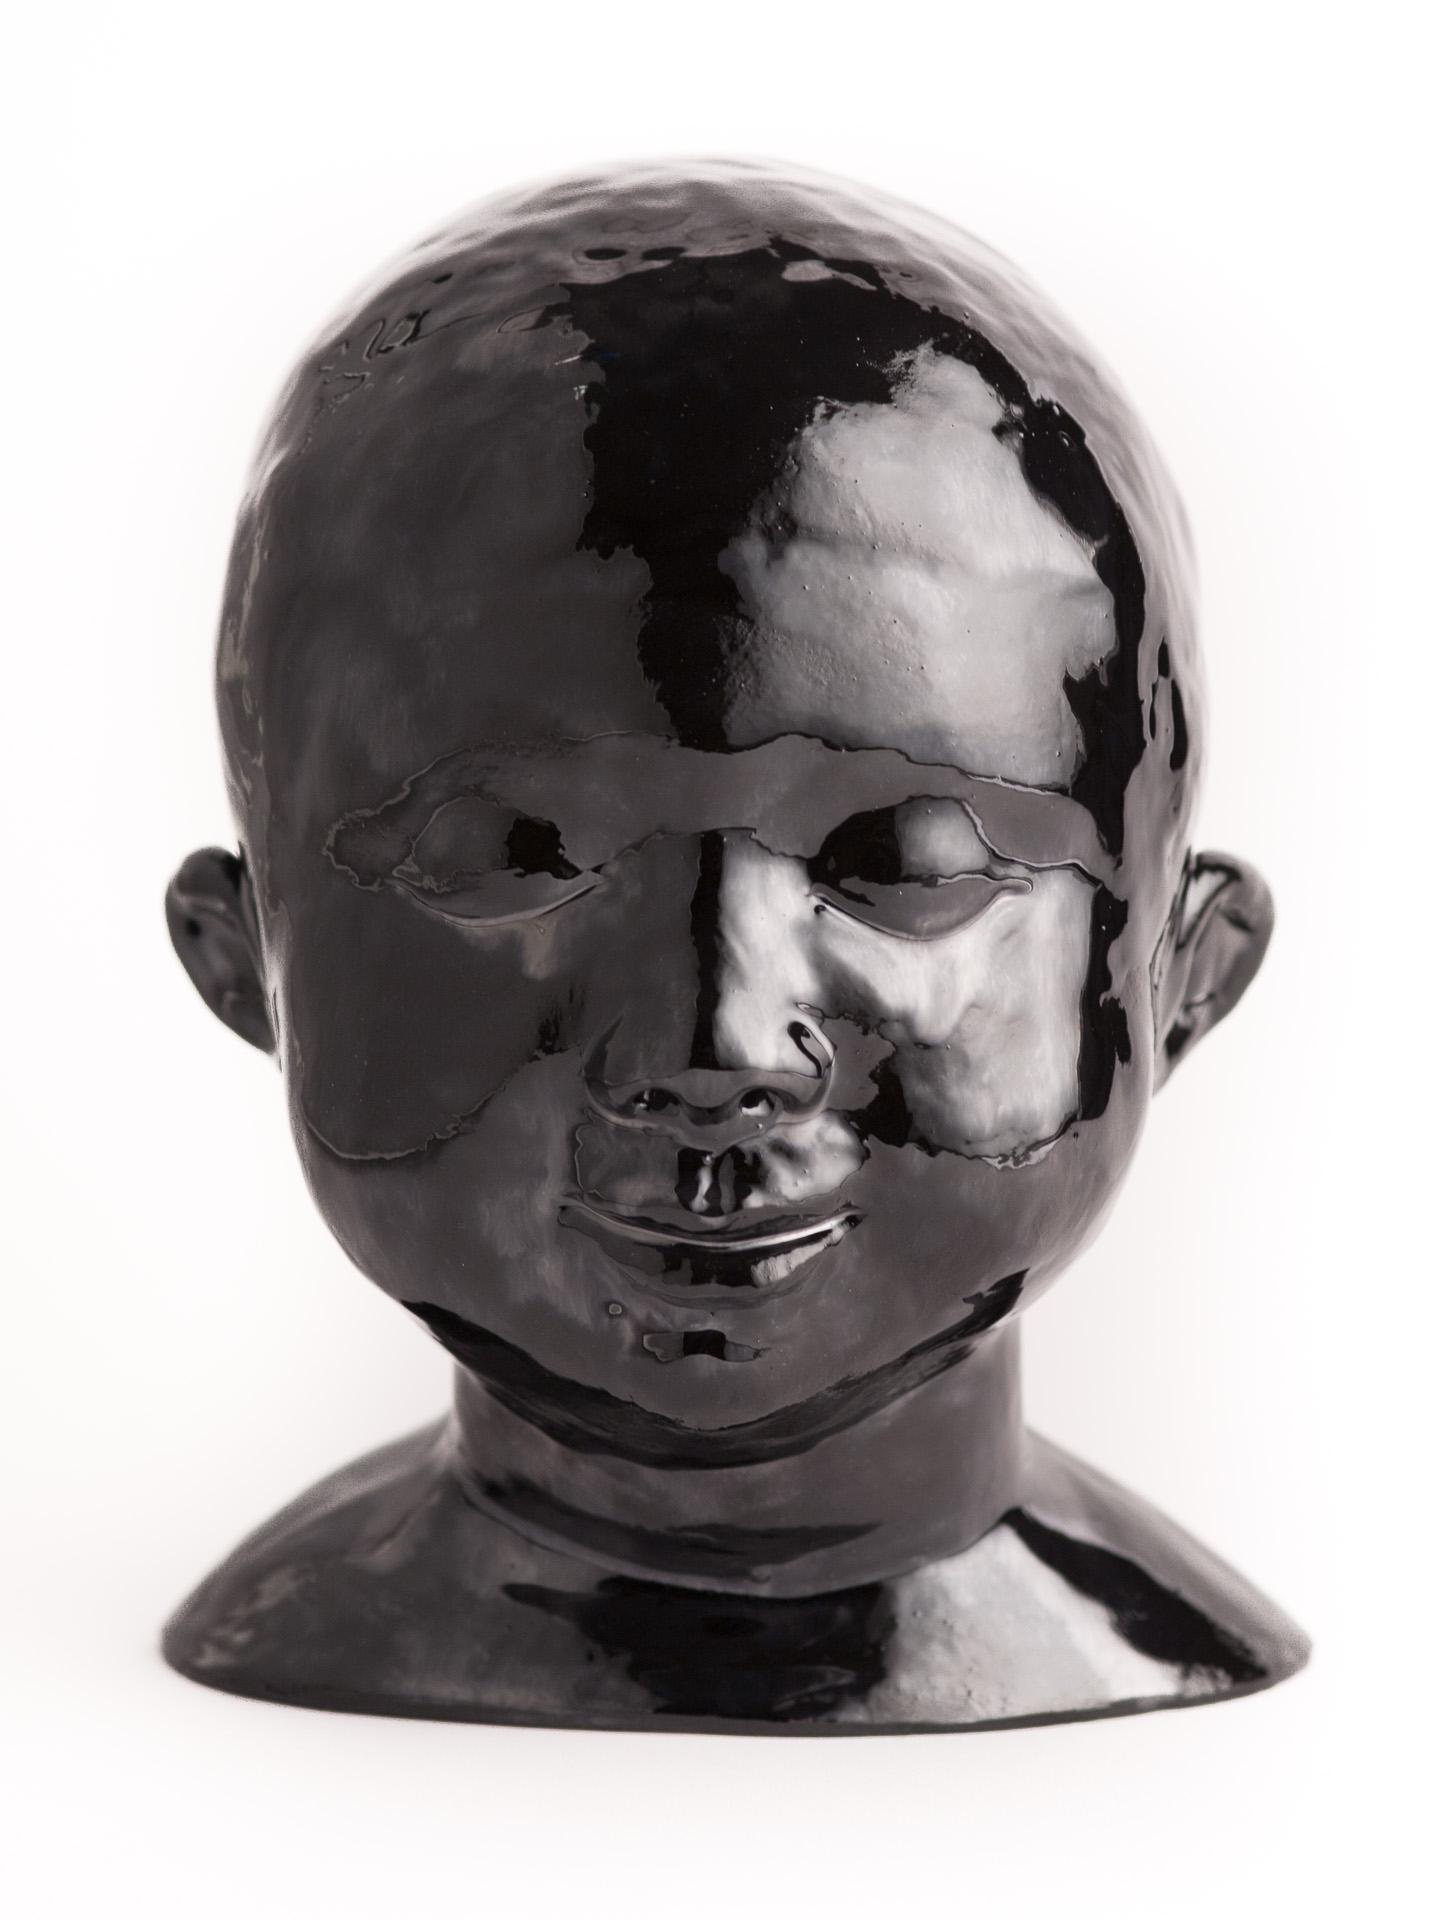 A12. Jacob Foran. Ceramic, Glaze. 9.7.7in. 2015